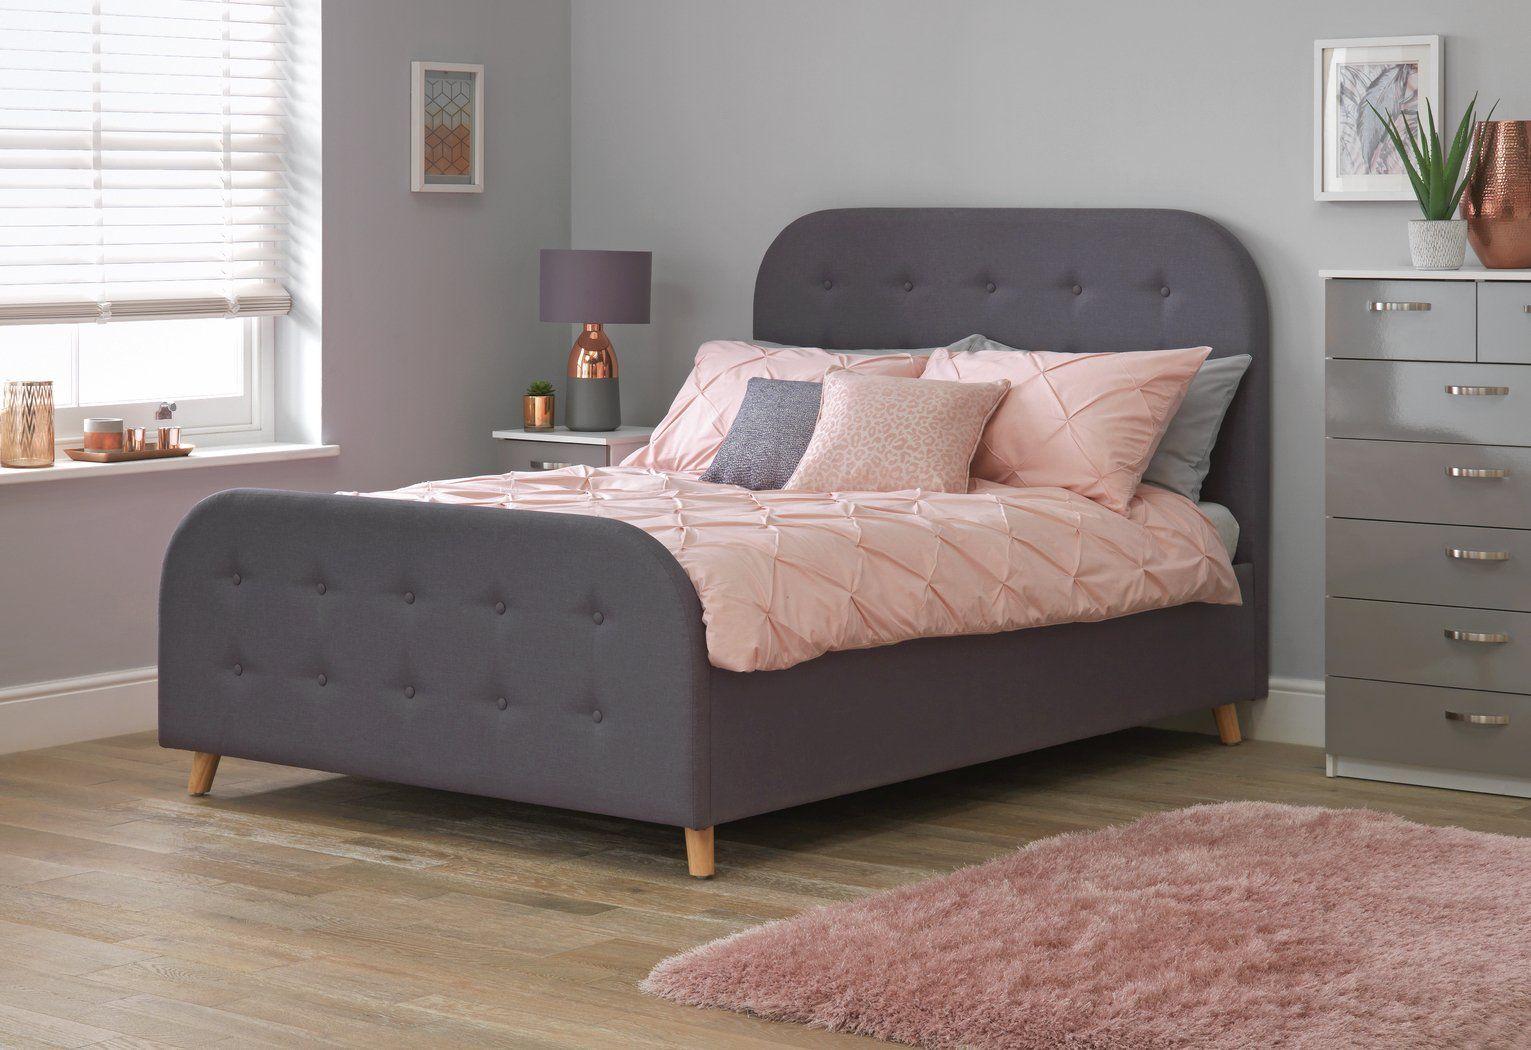 Buy Argos Home Ashby Ottoman Small Double Bed Frame Grey